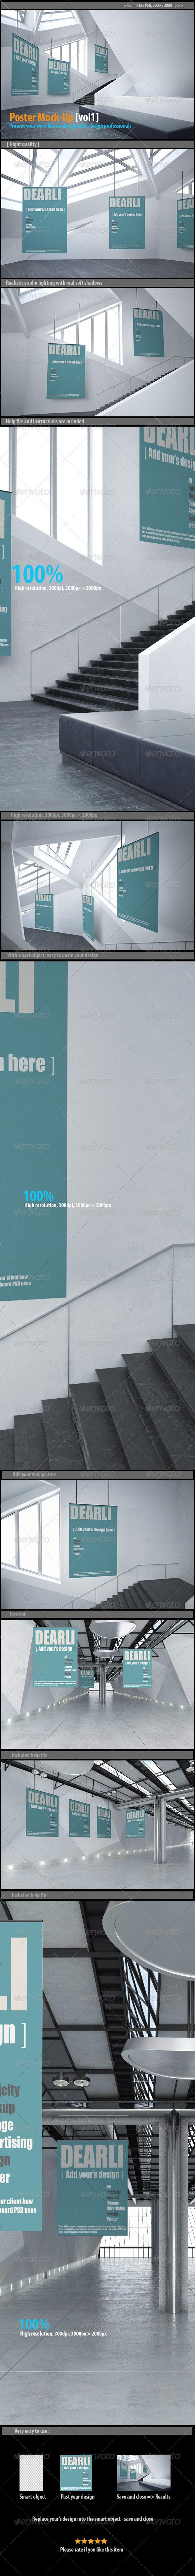 GraphicRiver Poster Mockups [vol1] 8194038